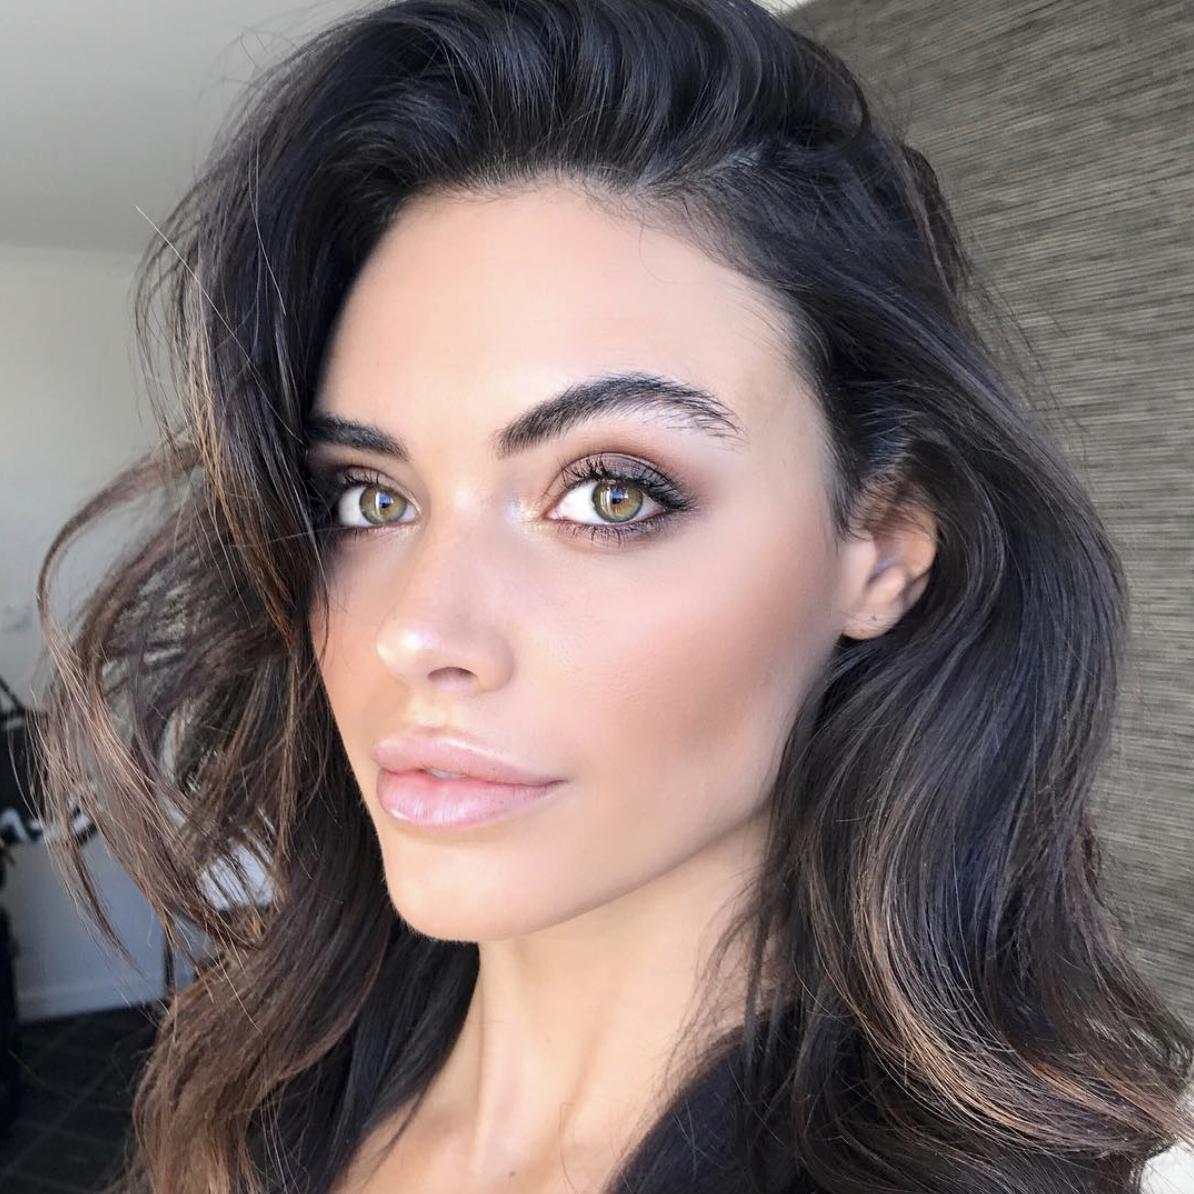 selfie of brunette model with big lips and natural make up